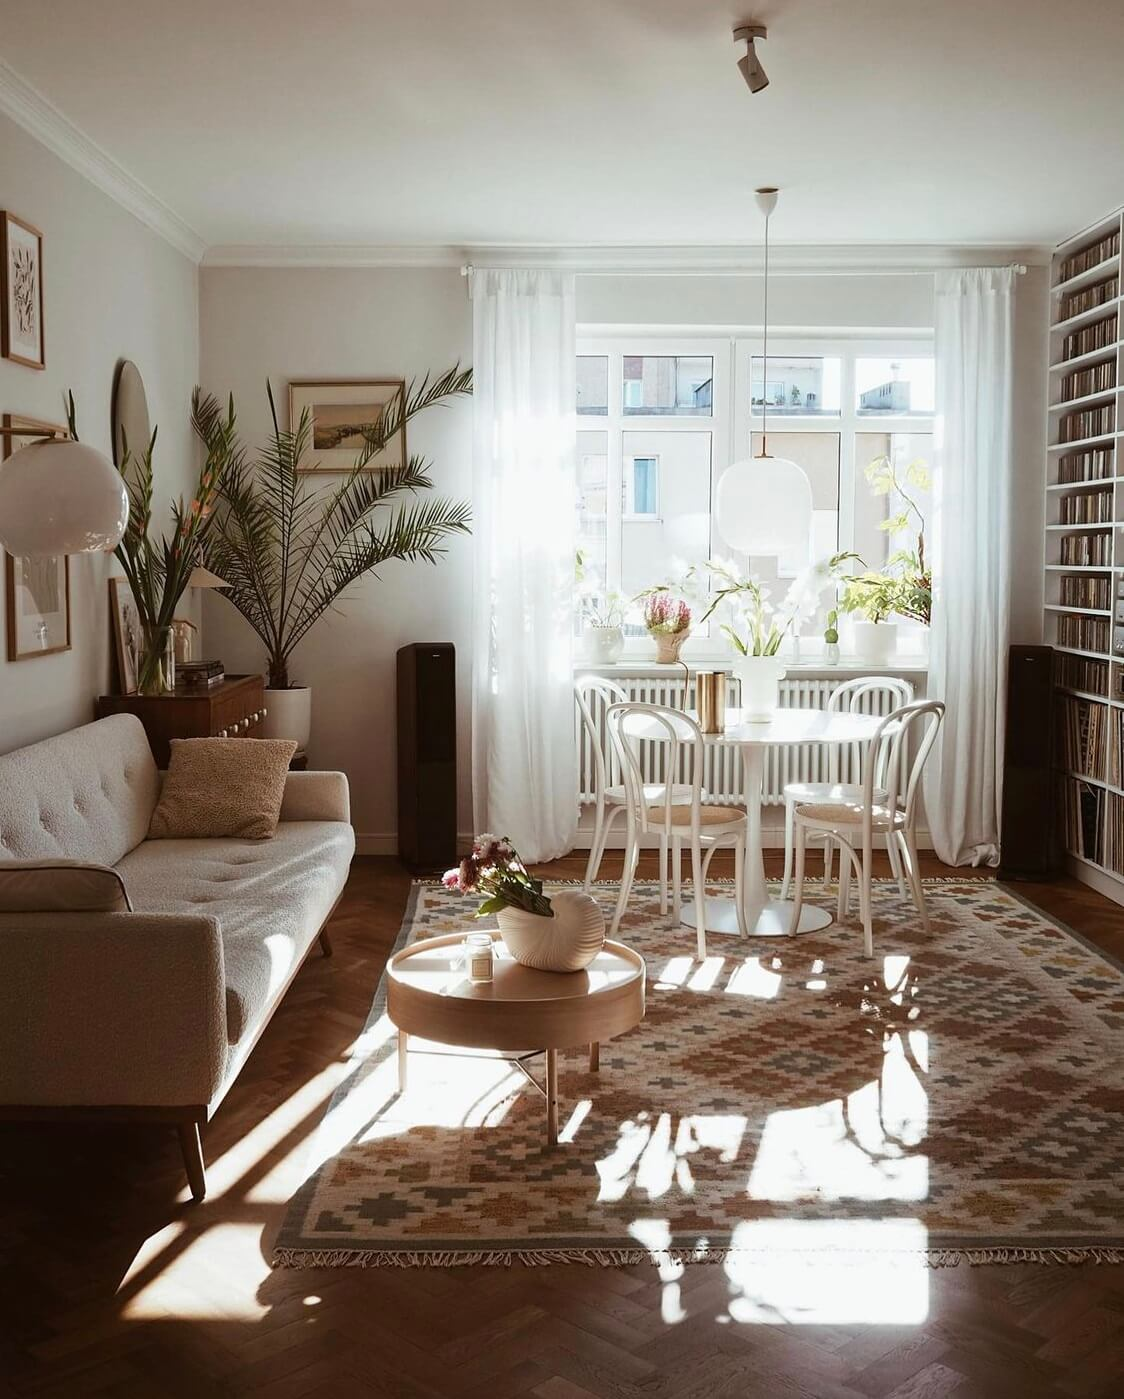 A Warm Scandinavian-Inspired Home in Poland